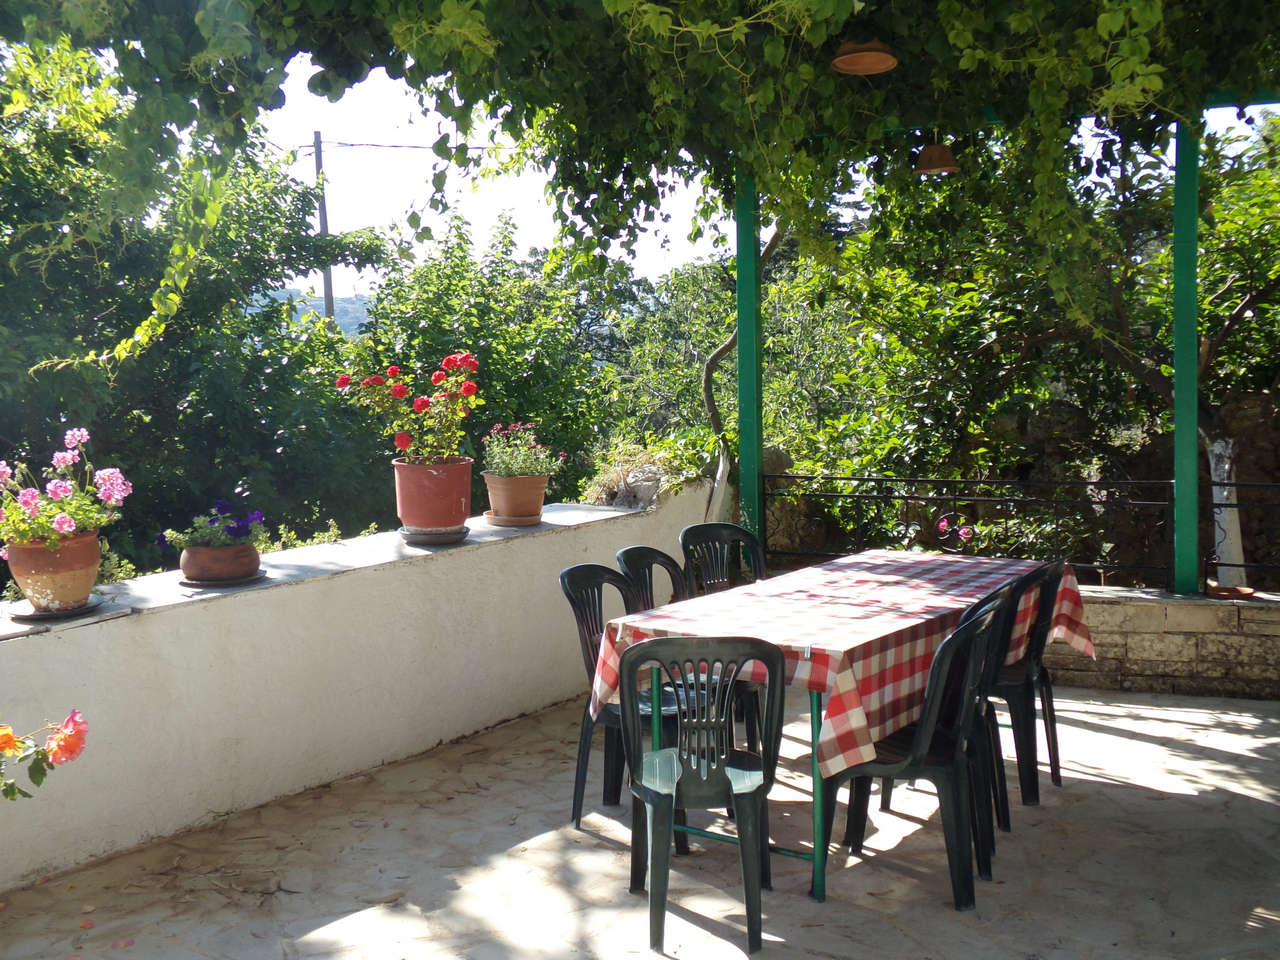 entrance-of-vasilis-tavern-homemade-food-local-products-cretan-cousin-diet-tavern-castello-castellos-armenoi-rethymno-crete